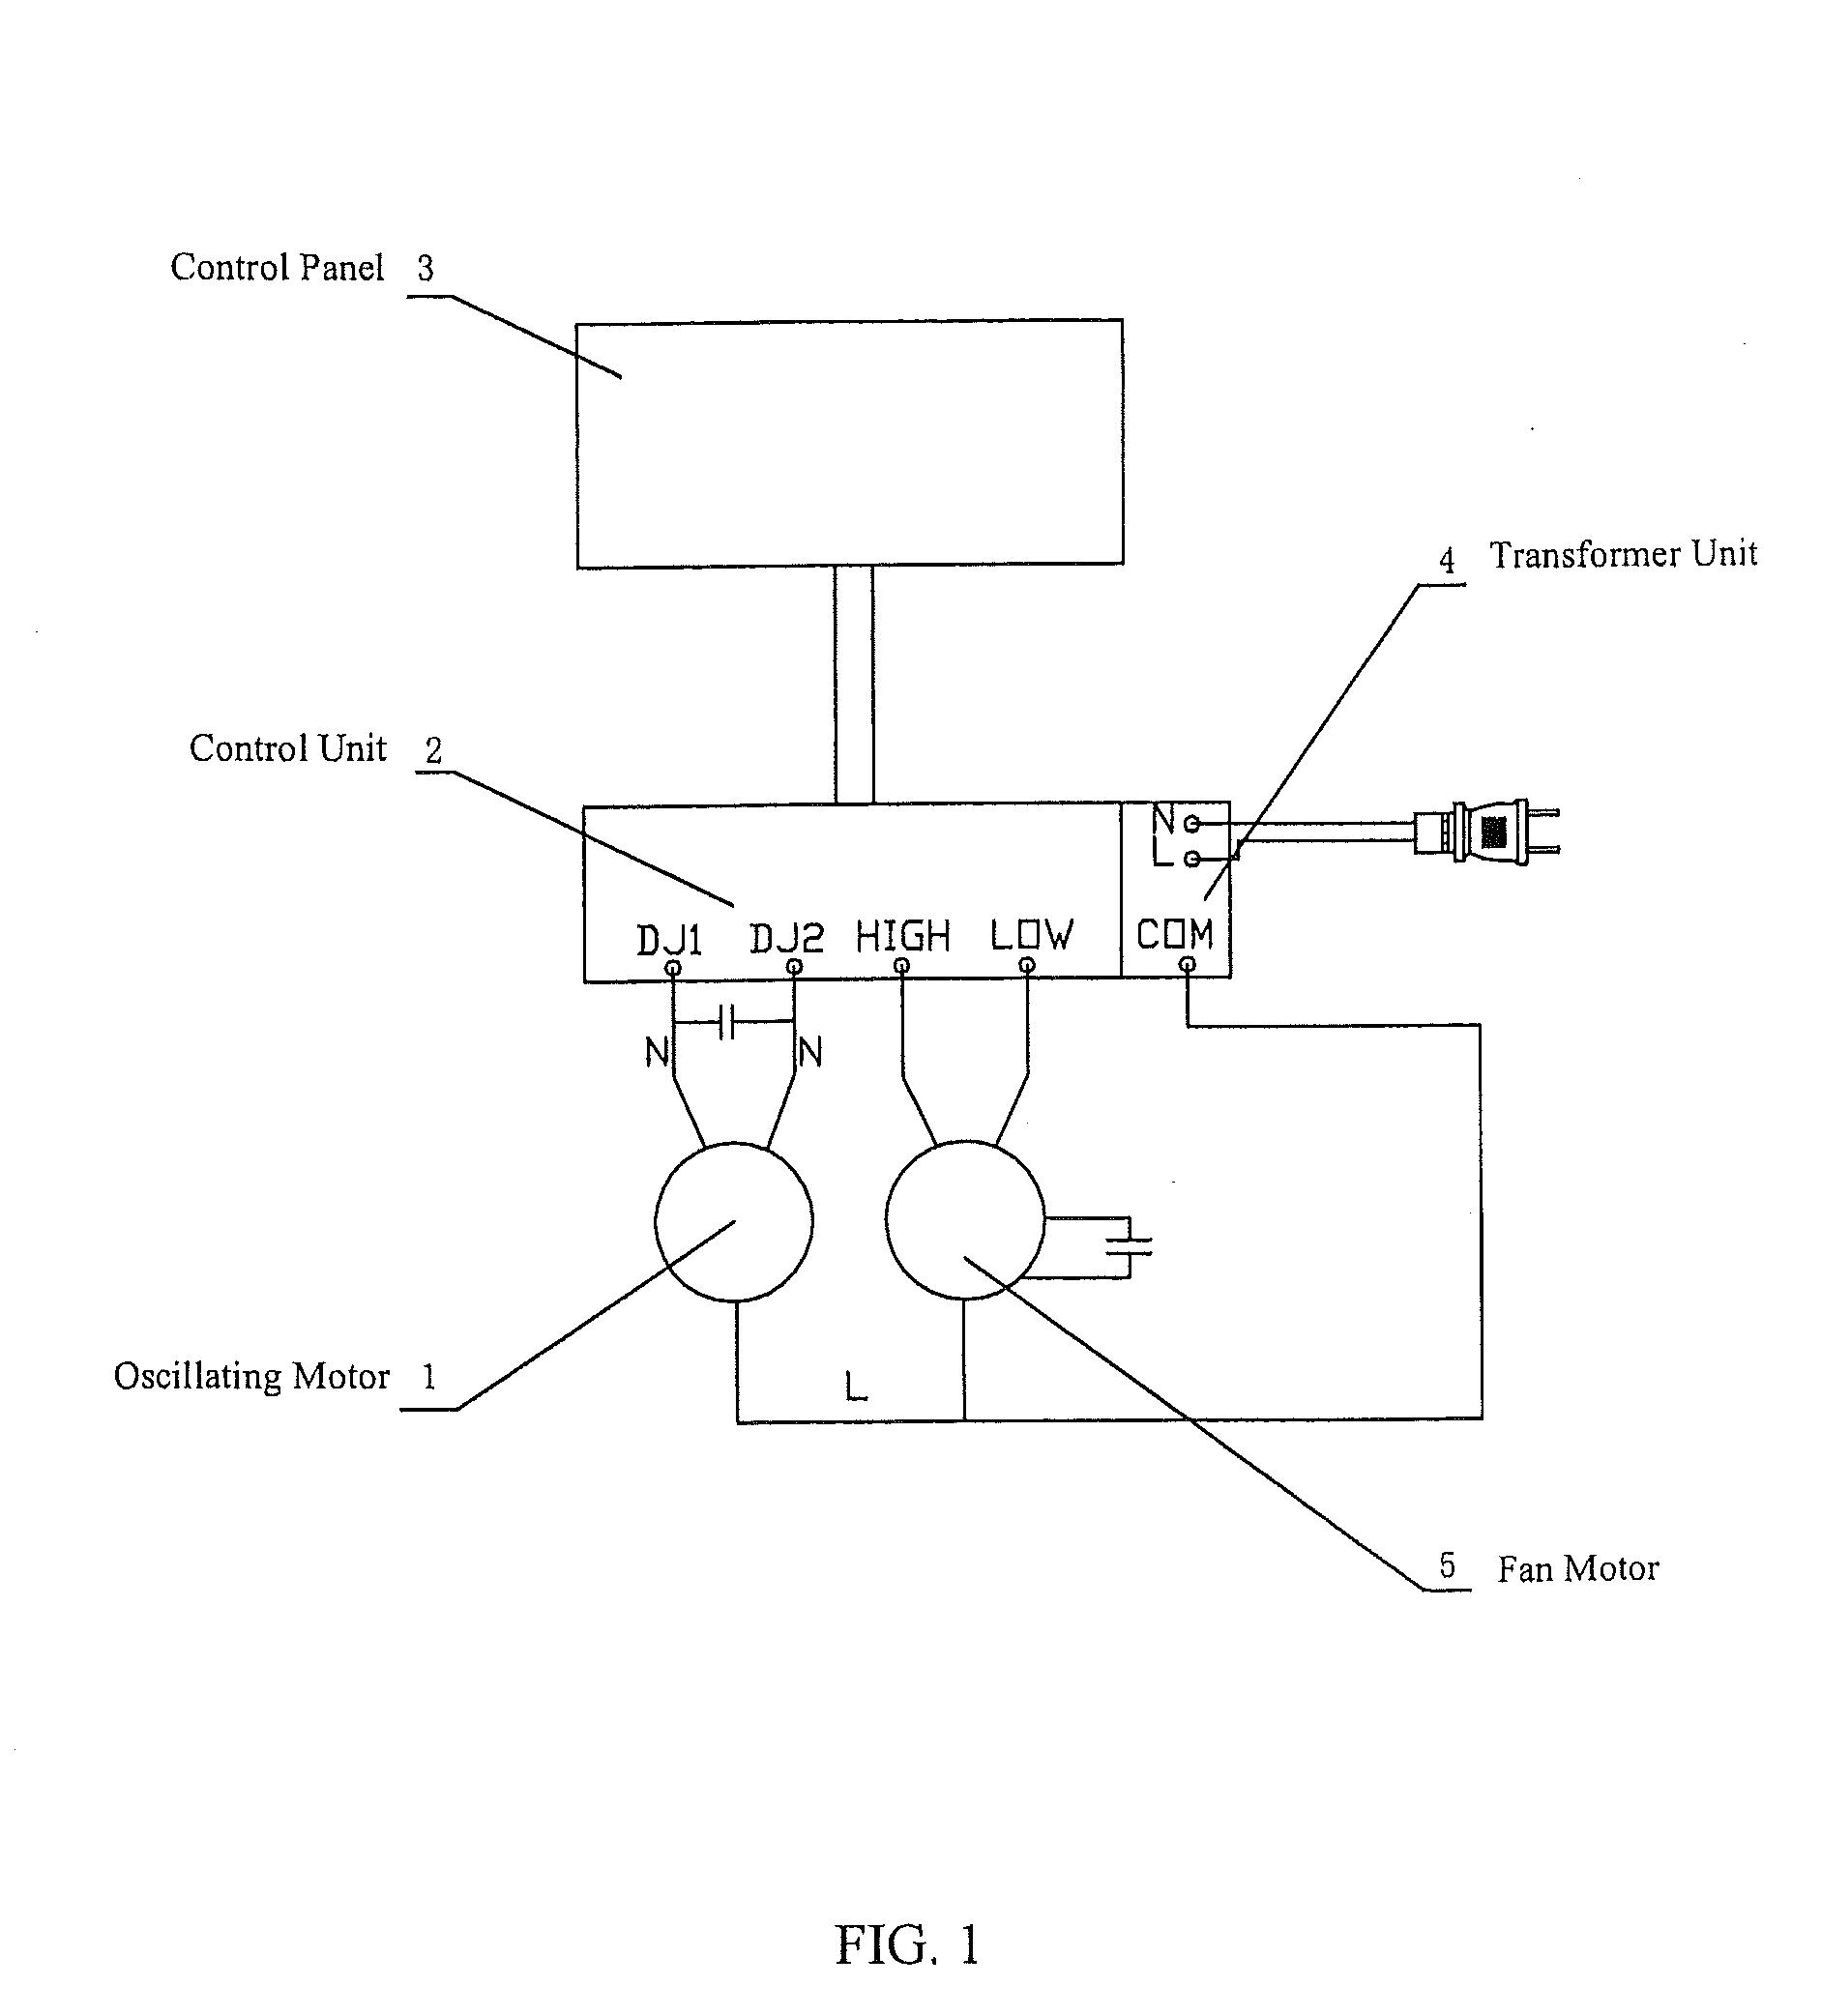 Diagram Three Sd Fan Wiring Diagram Full Version Hd Quality Wiring Diagram Blogwiring2l Atuttasosta It